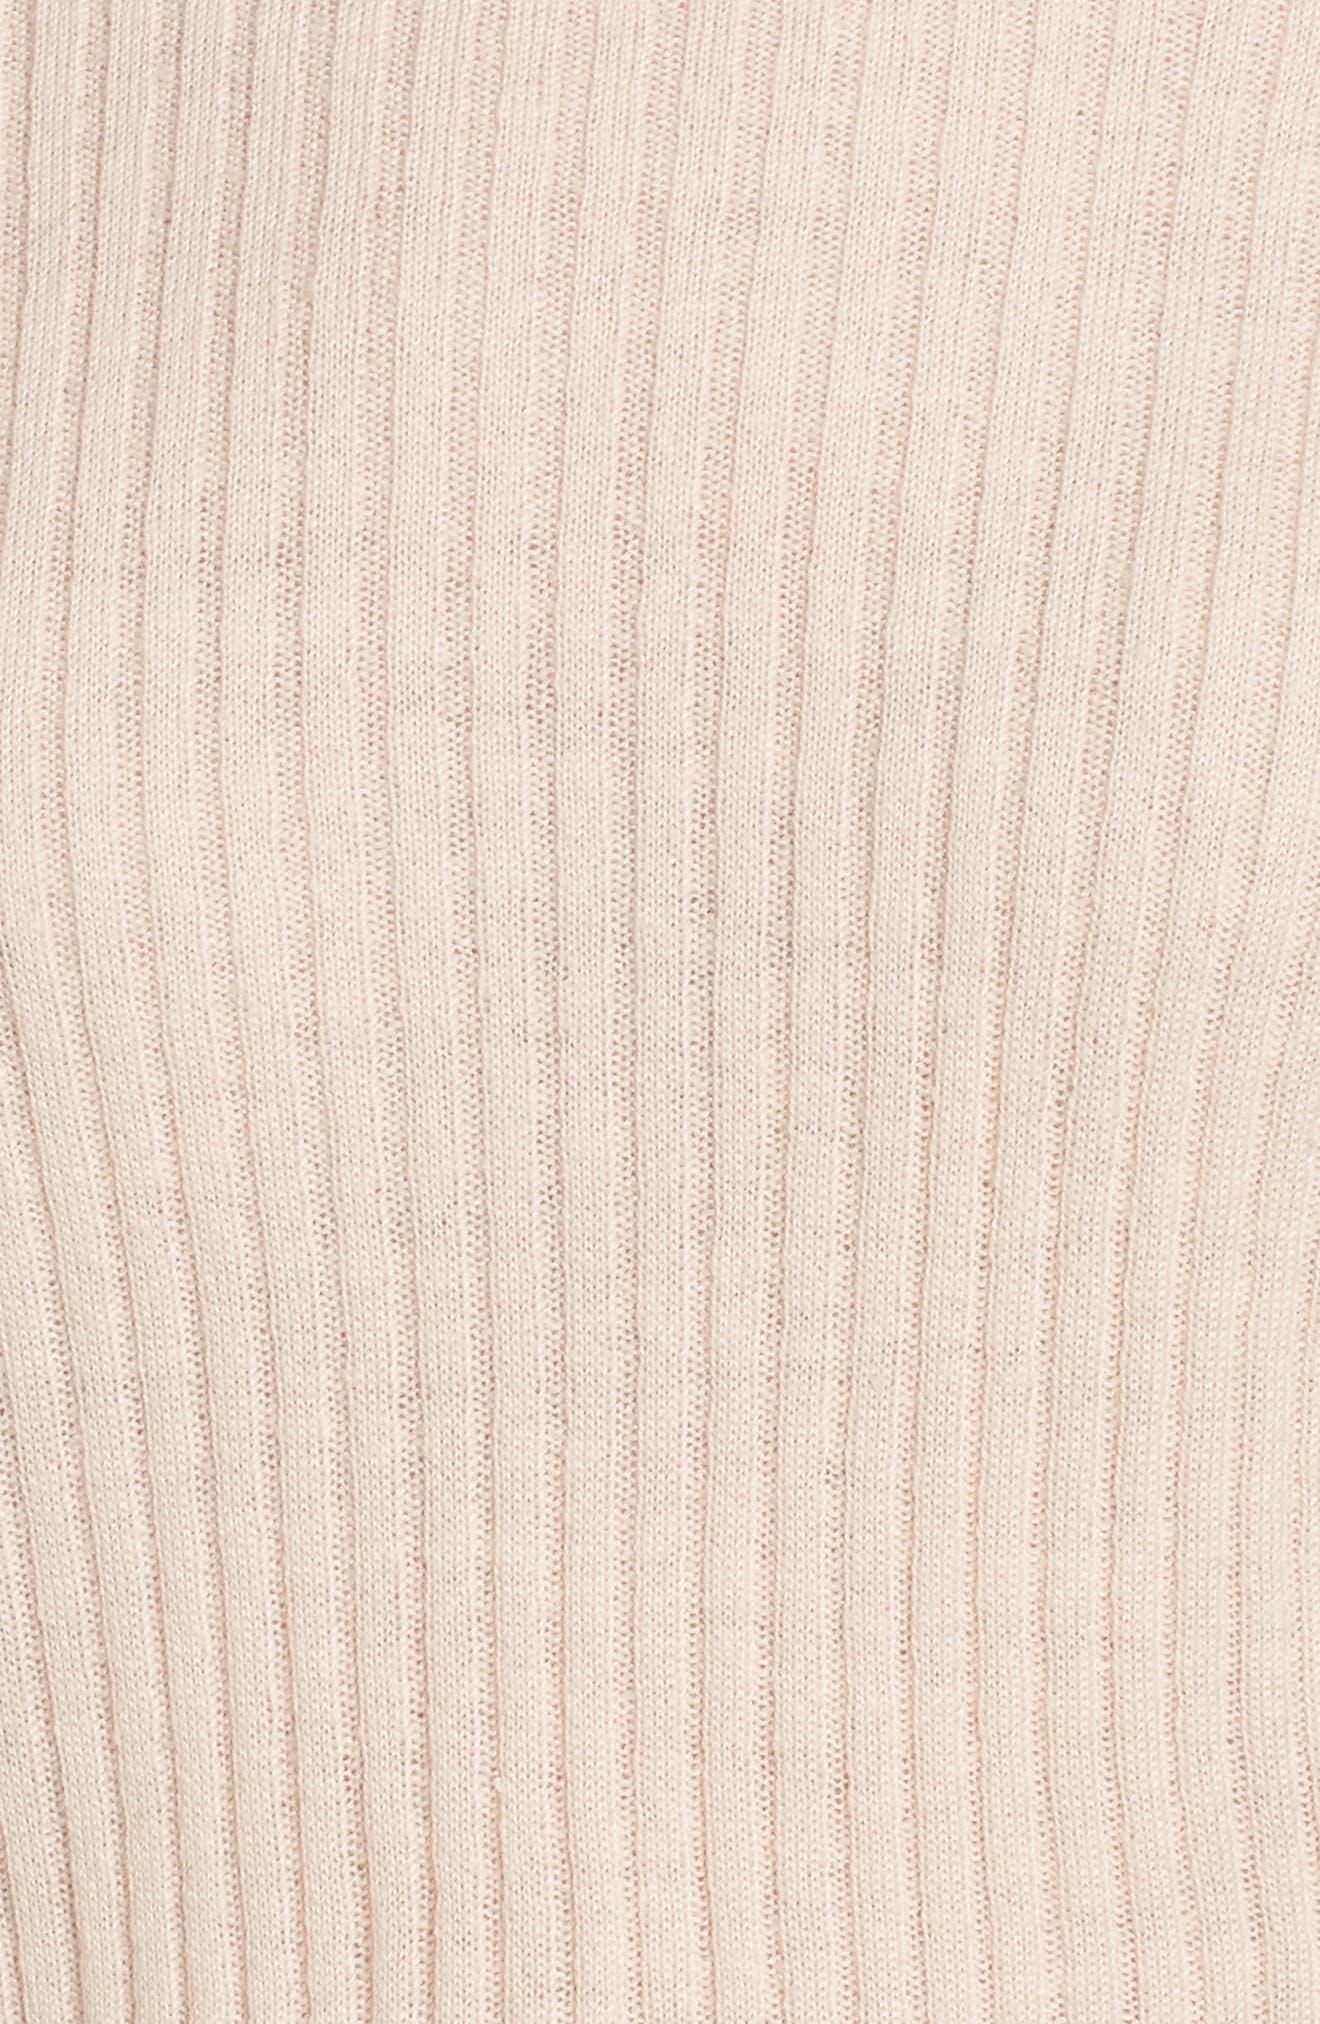 Tiara Bell Sleeve Sweater,                             Alternate thumbnail 5, color,                             Blush